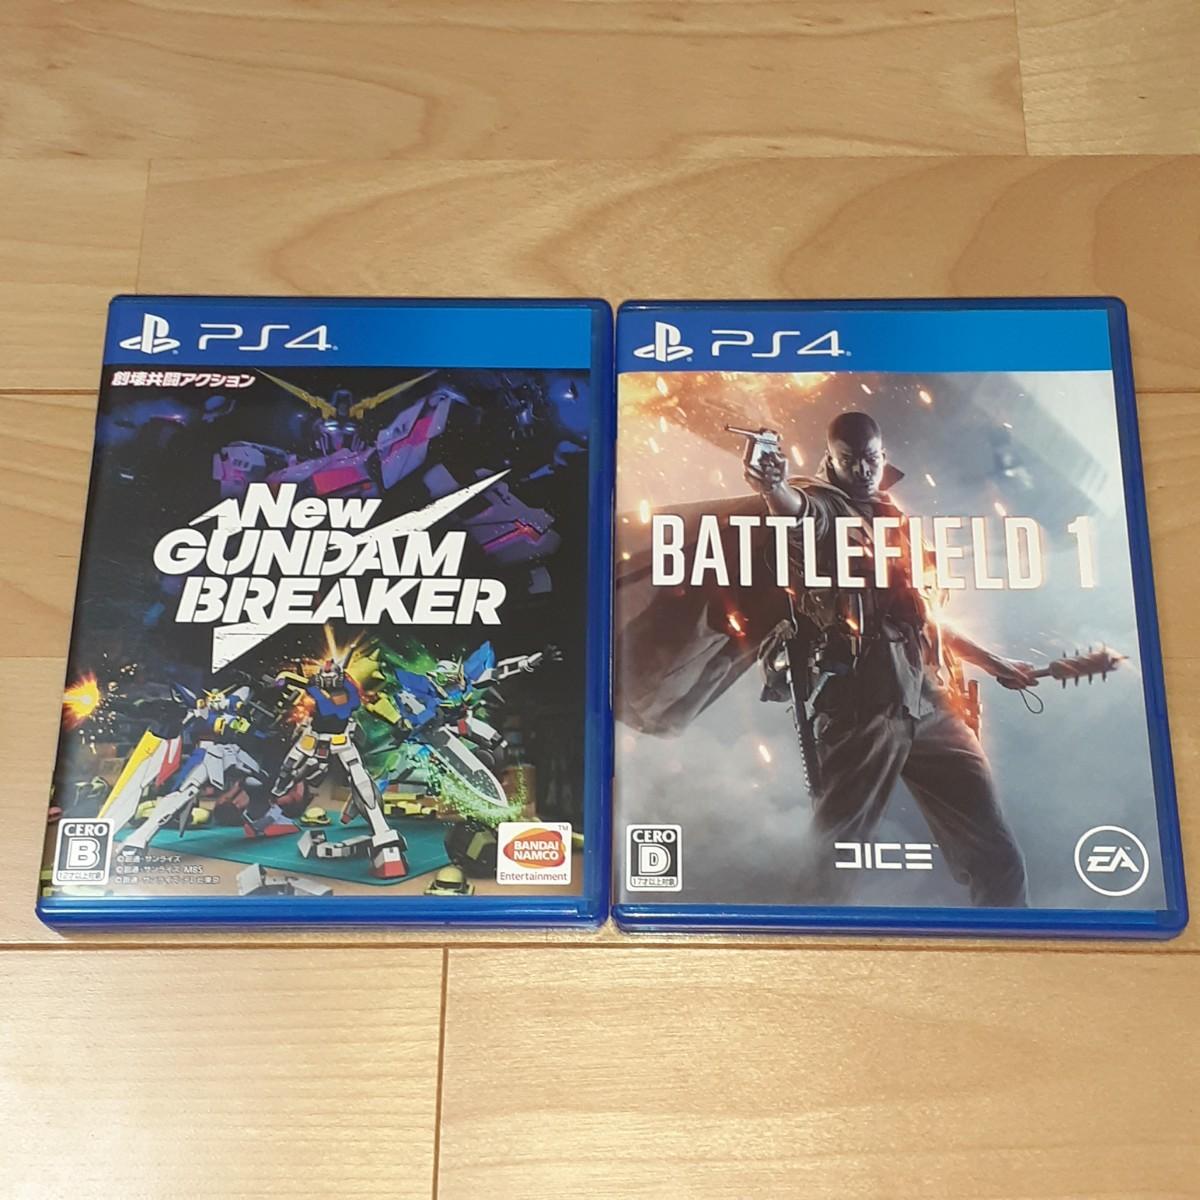 【PS4】 New ガンダムブレイカー [通常版] バトルフィールド1